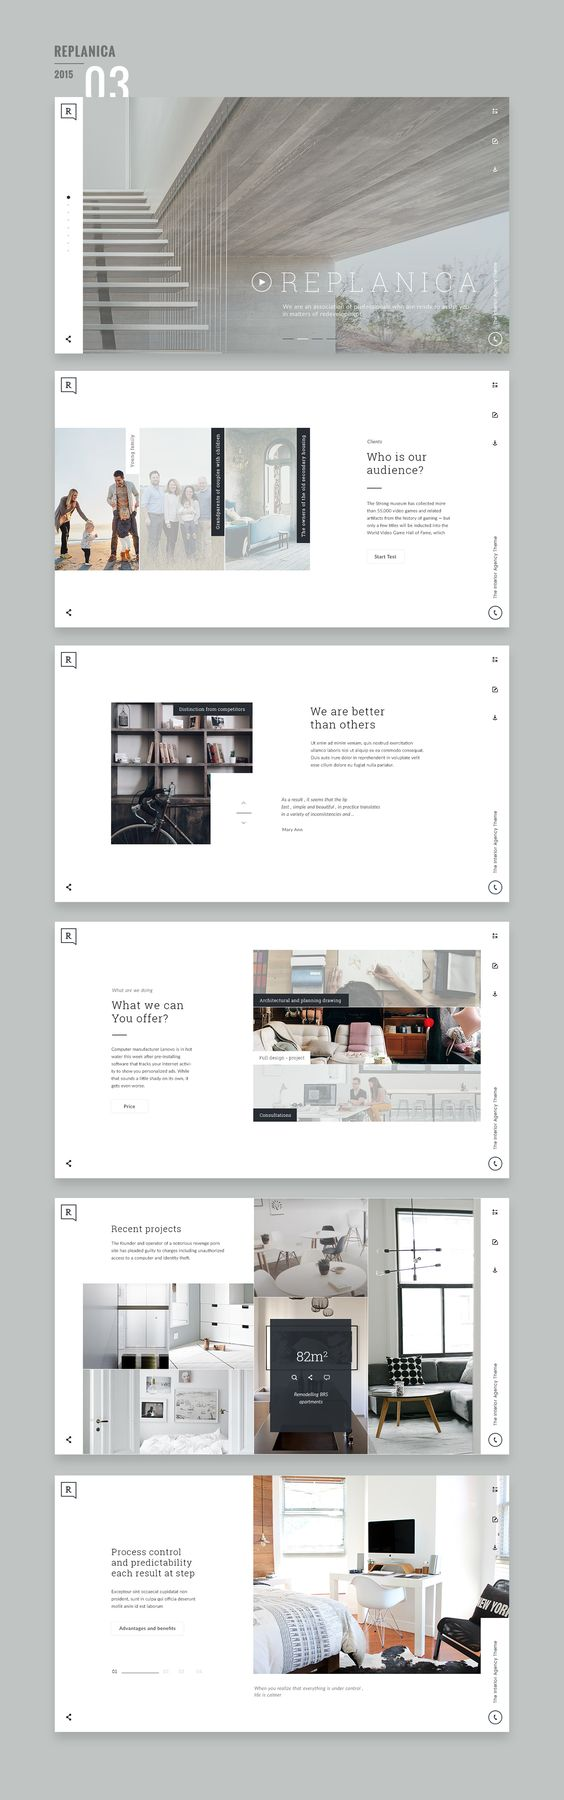 Website Design 2015/16 on Behance